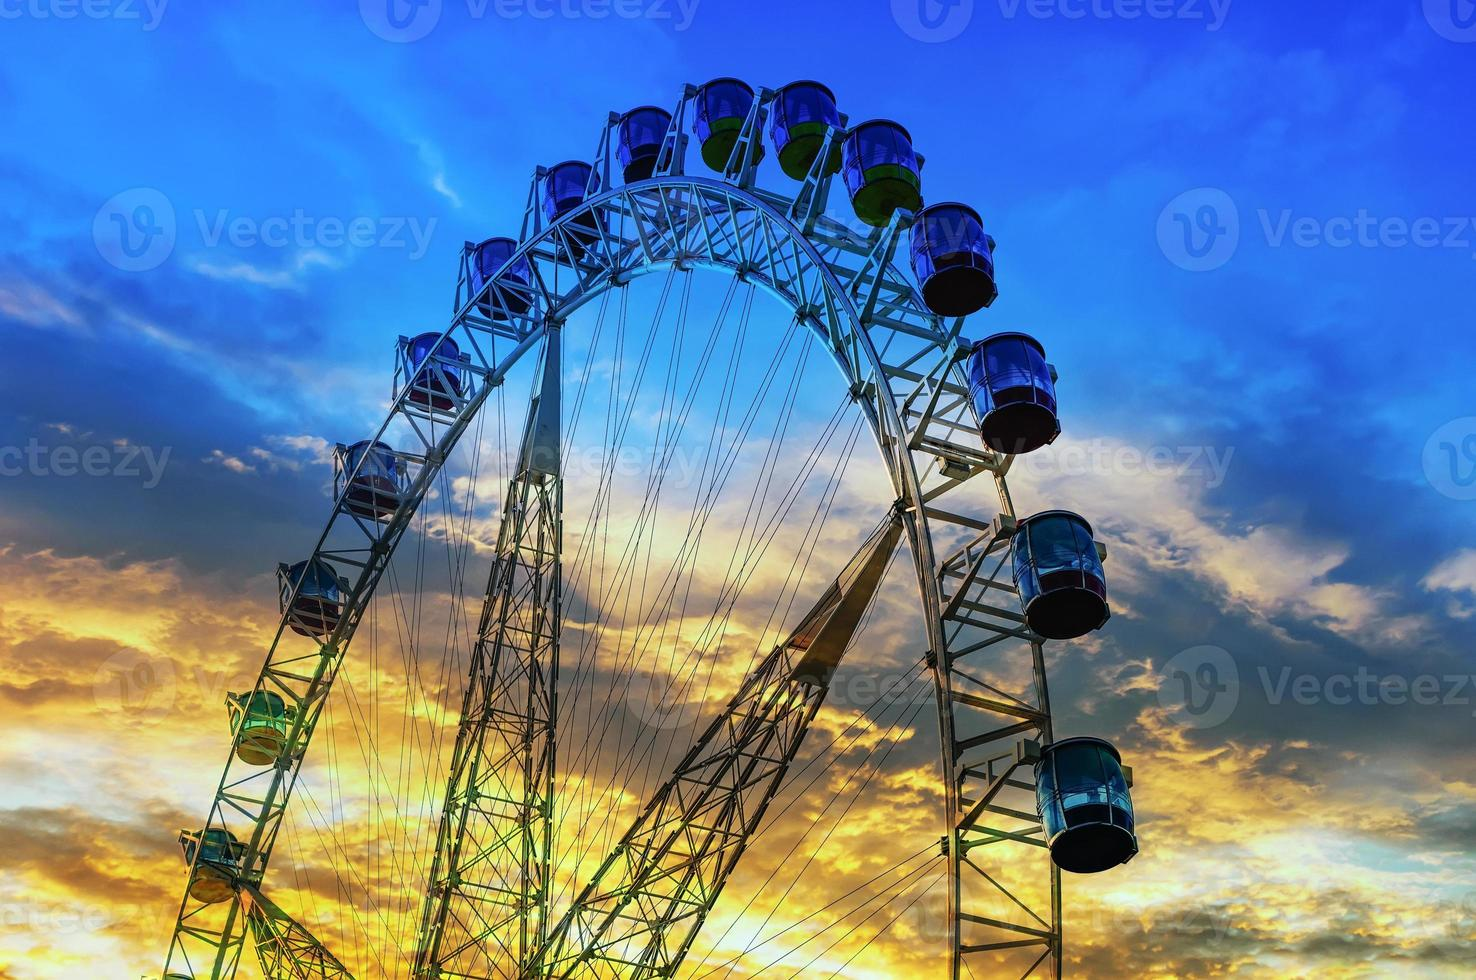 ferris wheel in sunset photo